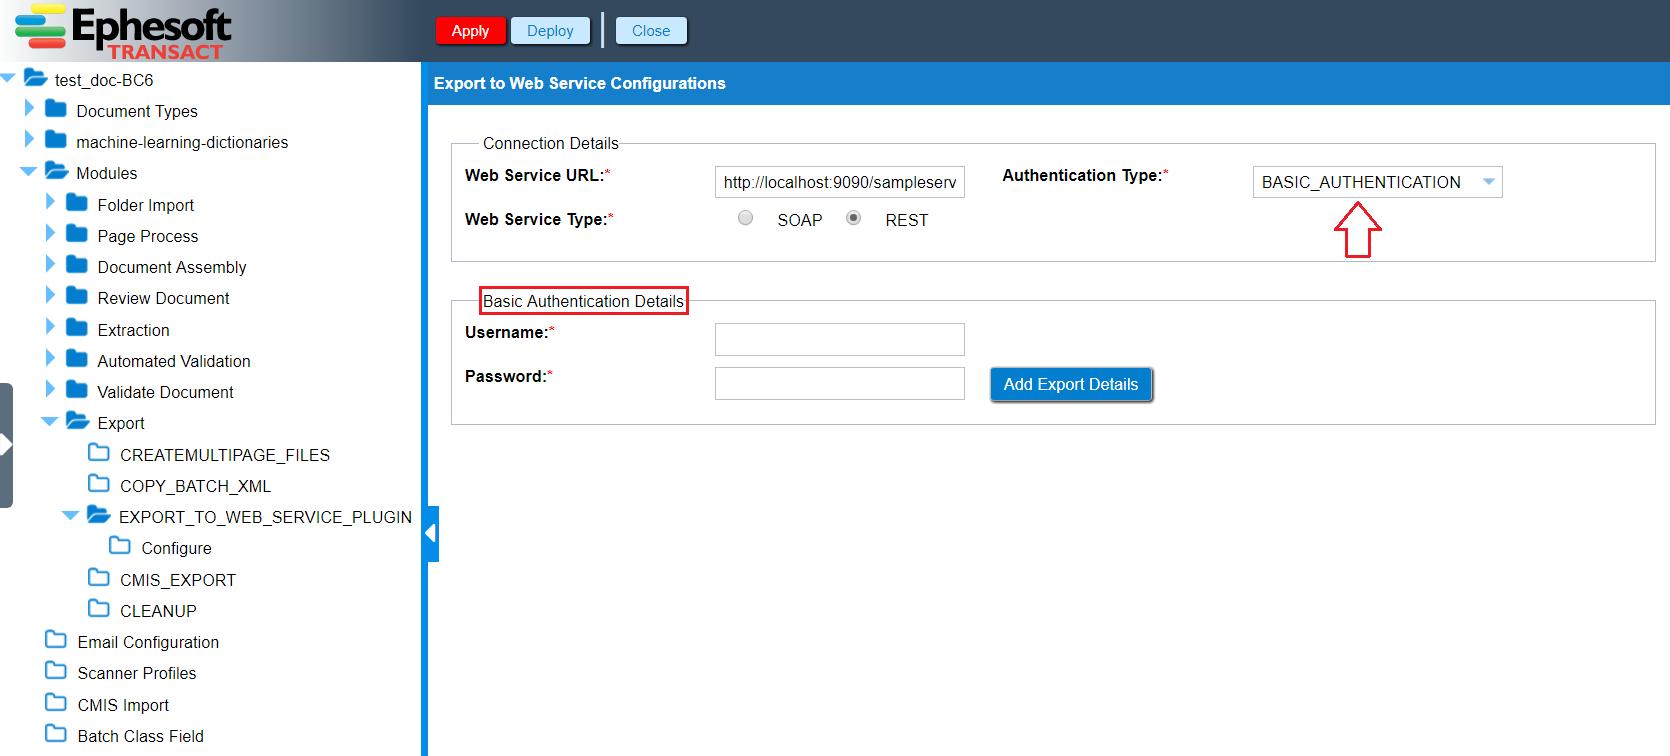 Export | Custom Export to Web Services Guide | Ephesoft Docs